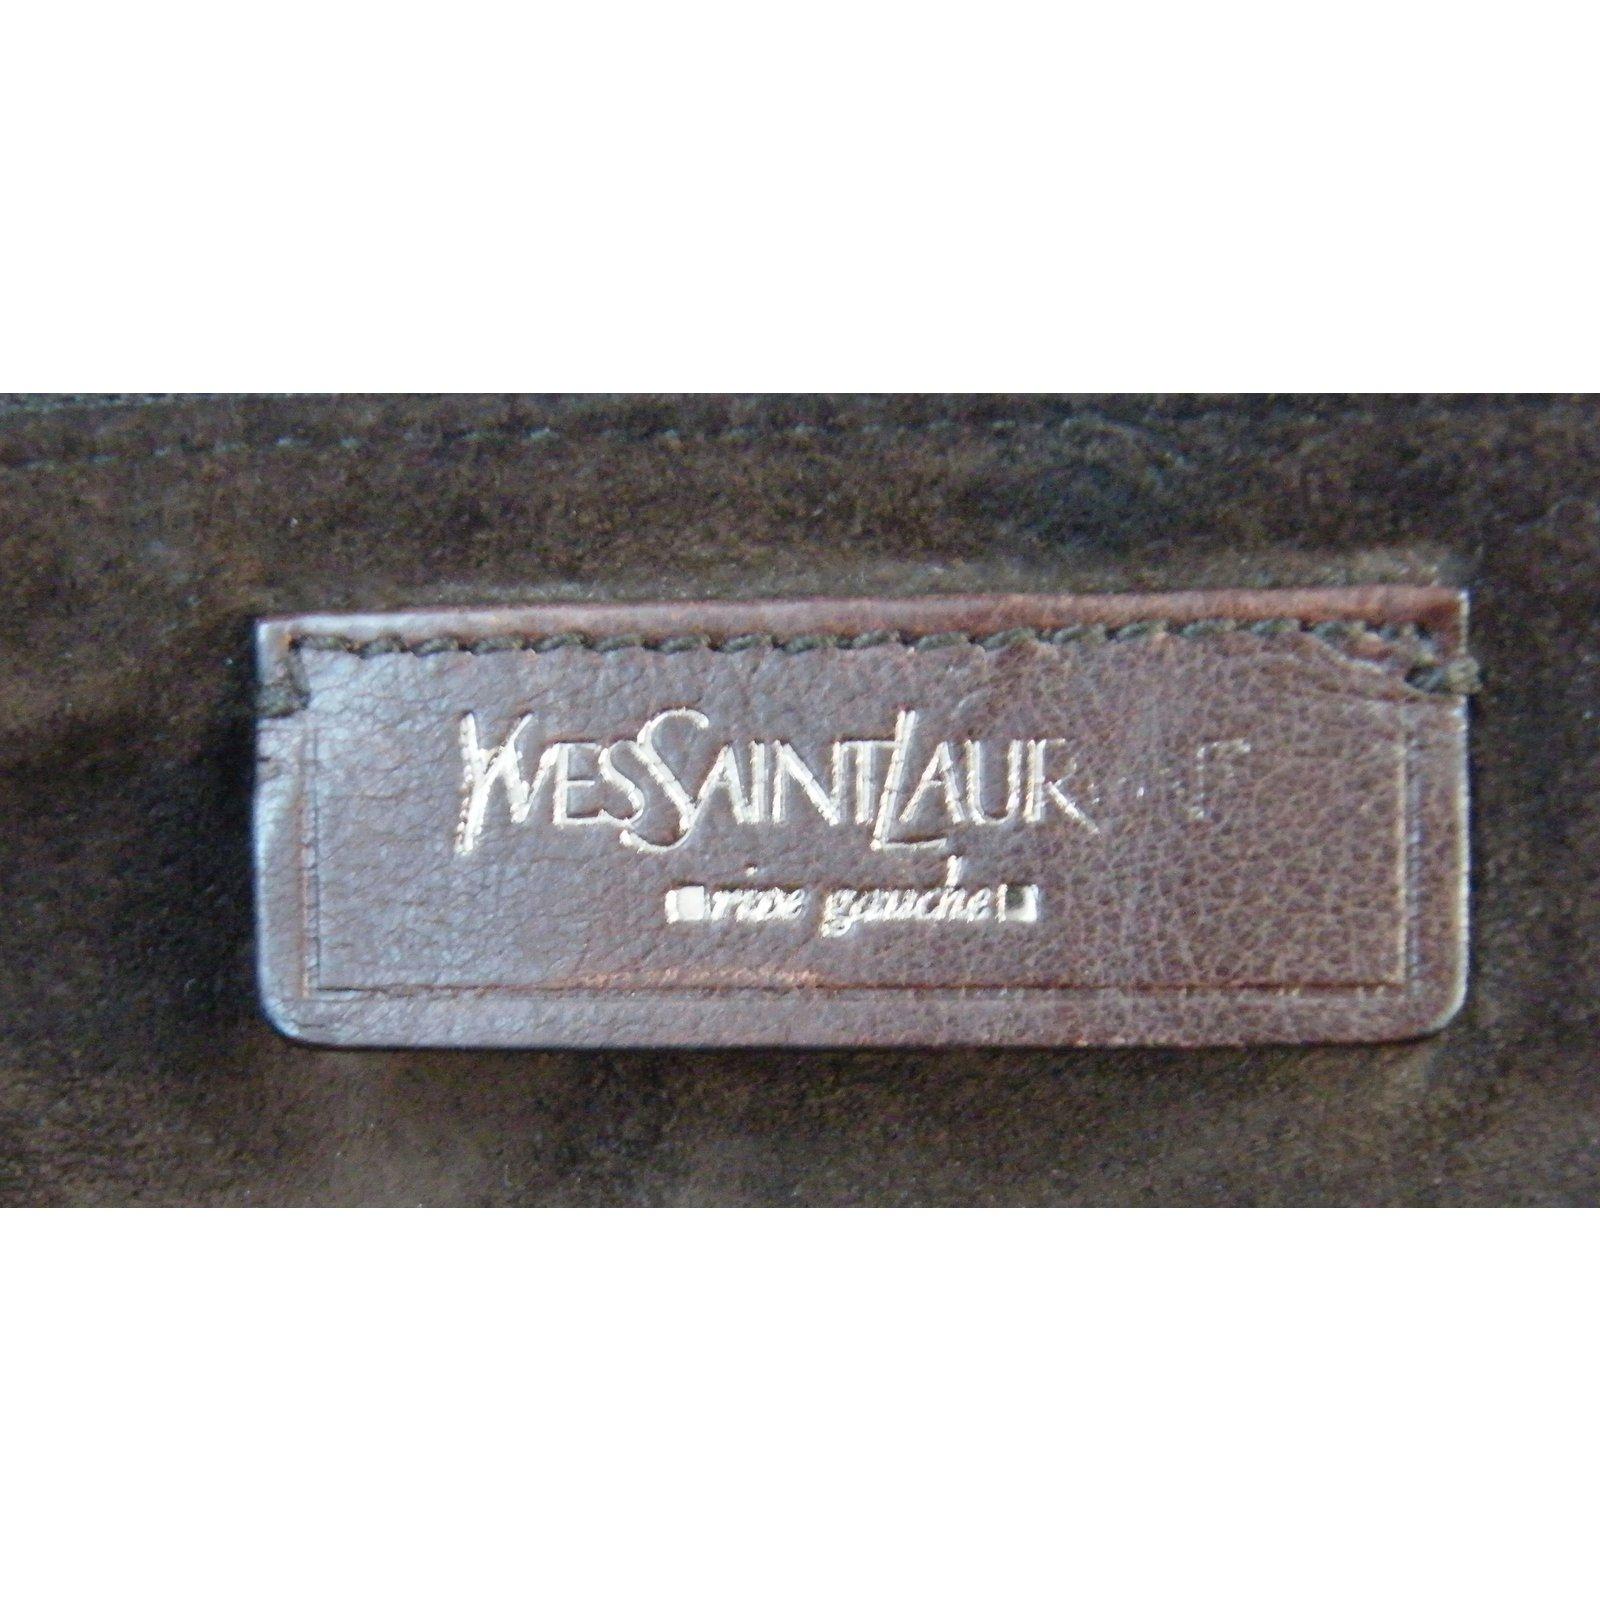 Facebook · Pin This. Yves Saint Laurent Handbags Handbags Leather Brown ref. 10870 904012810aa39